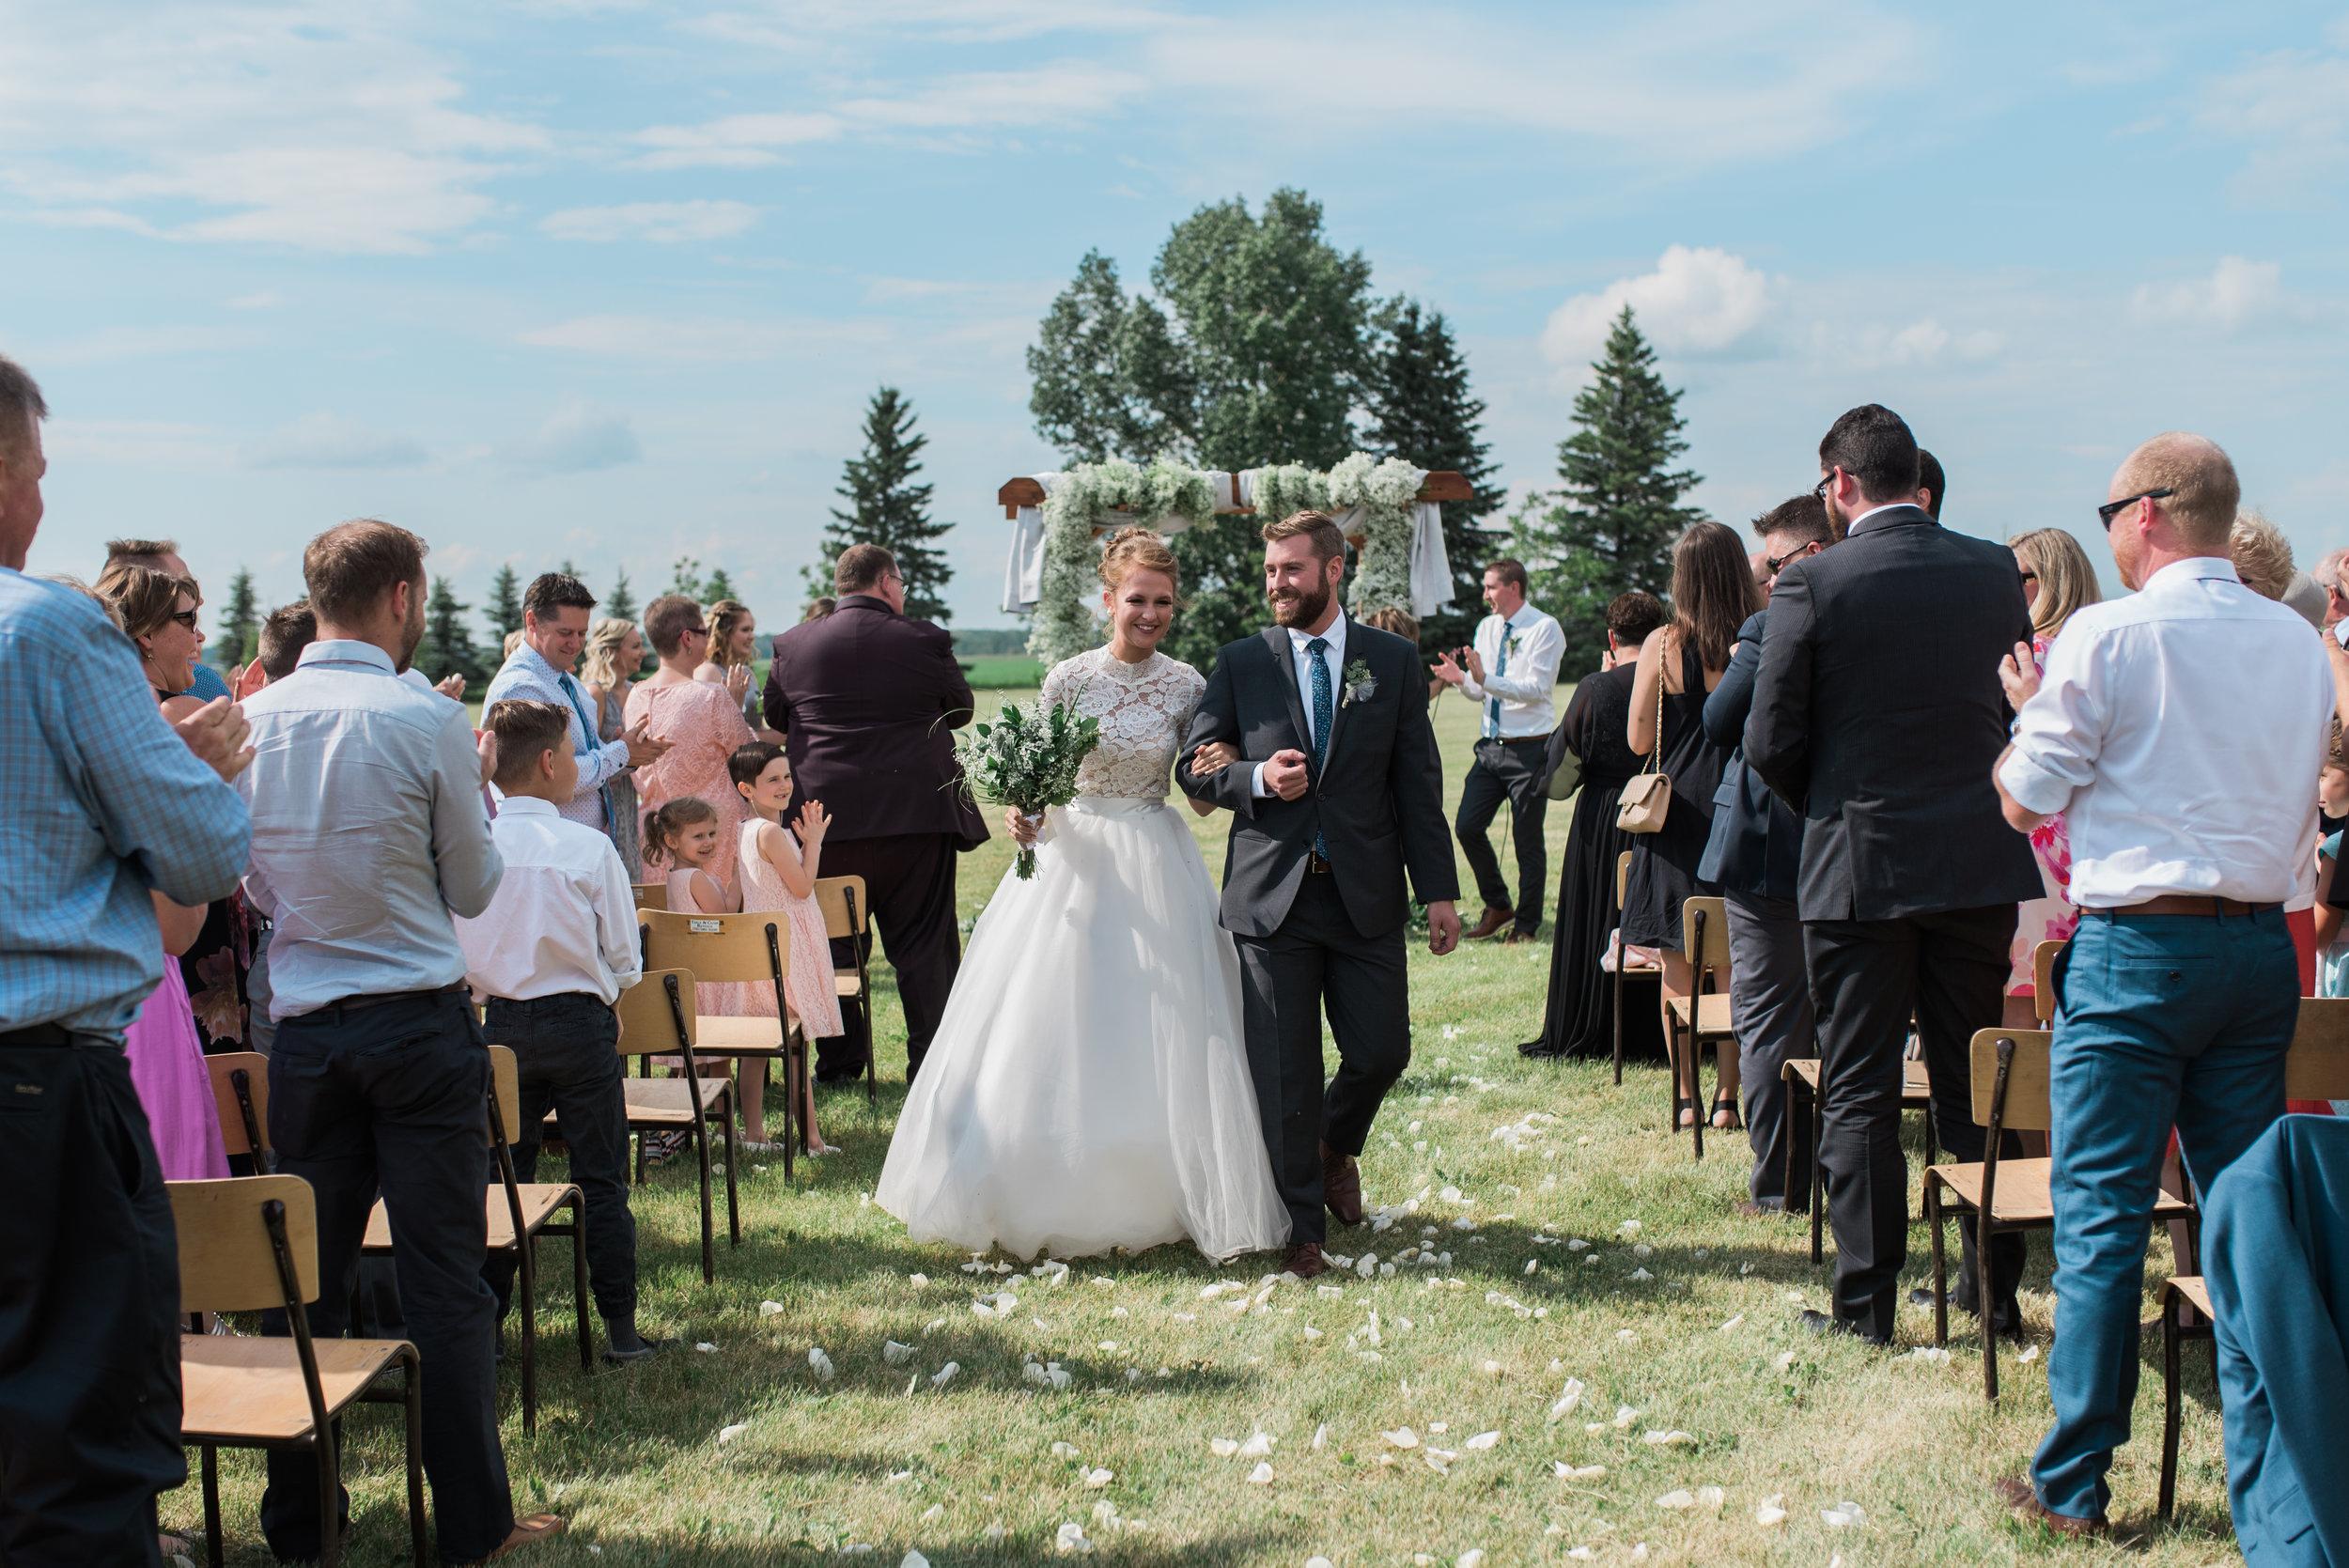 Elgert Wedding 2225-2.jpg